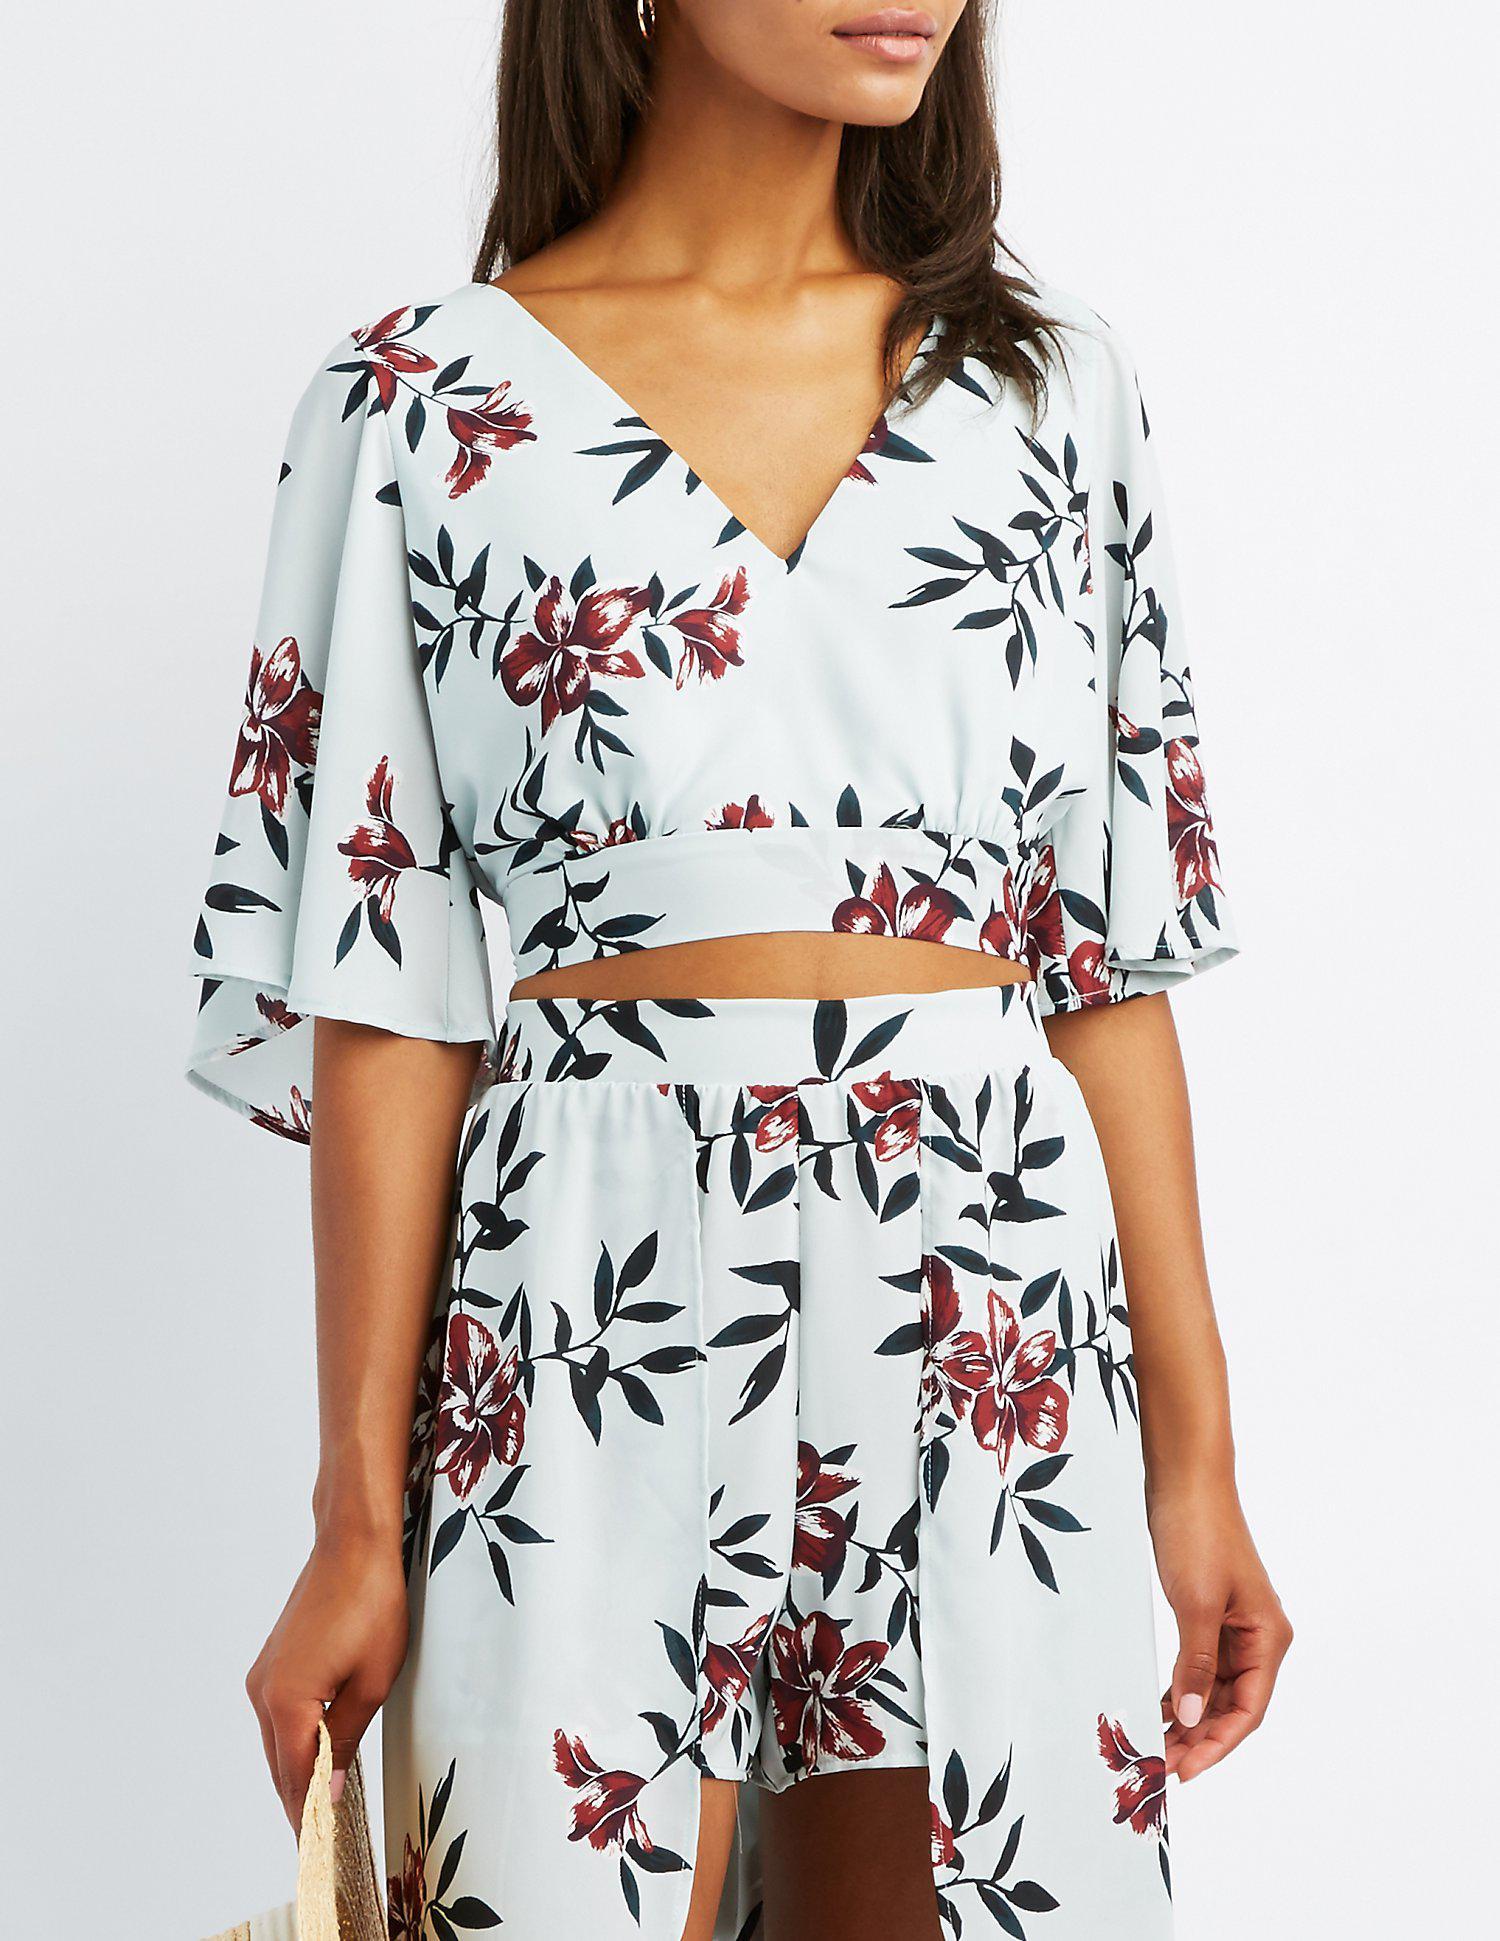 d22e0bdf5f147 Lyst - Charlotte Russe Floral Kimono Sleeve Crop Top